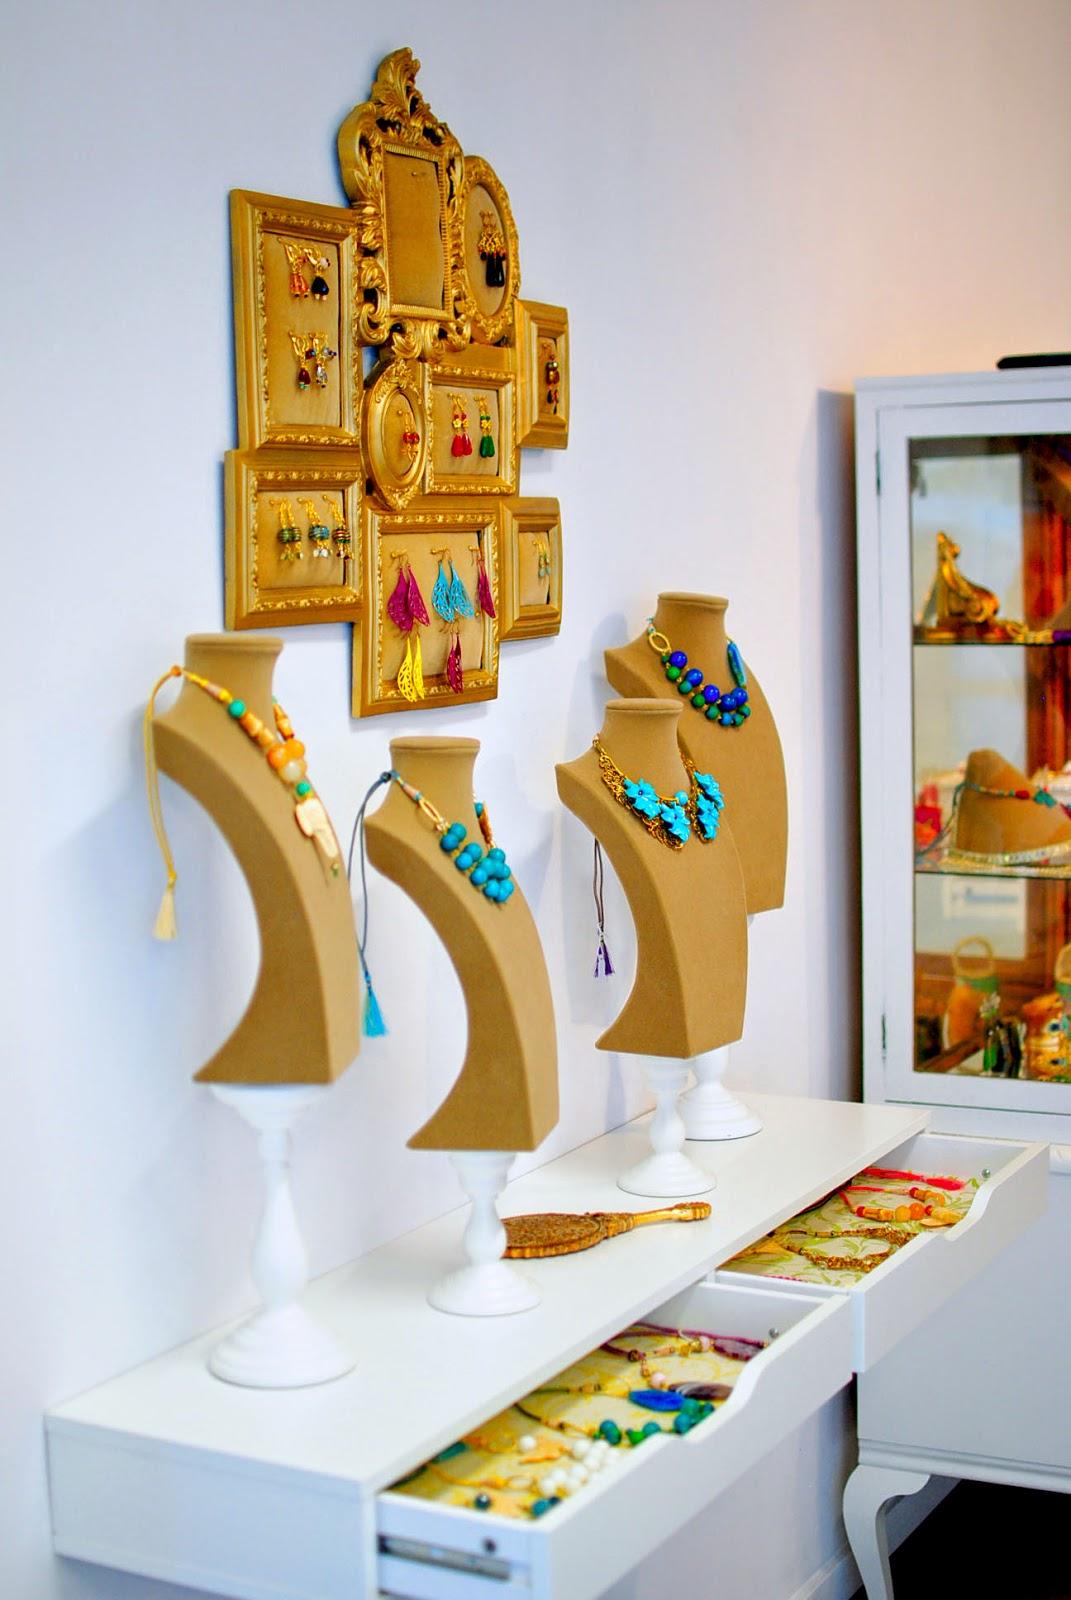 nery hdez, maharani , elisa salas, joyas diseñadas en canarias, moda en tenerife